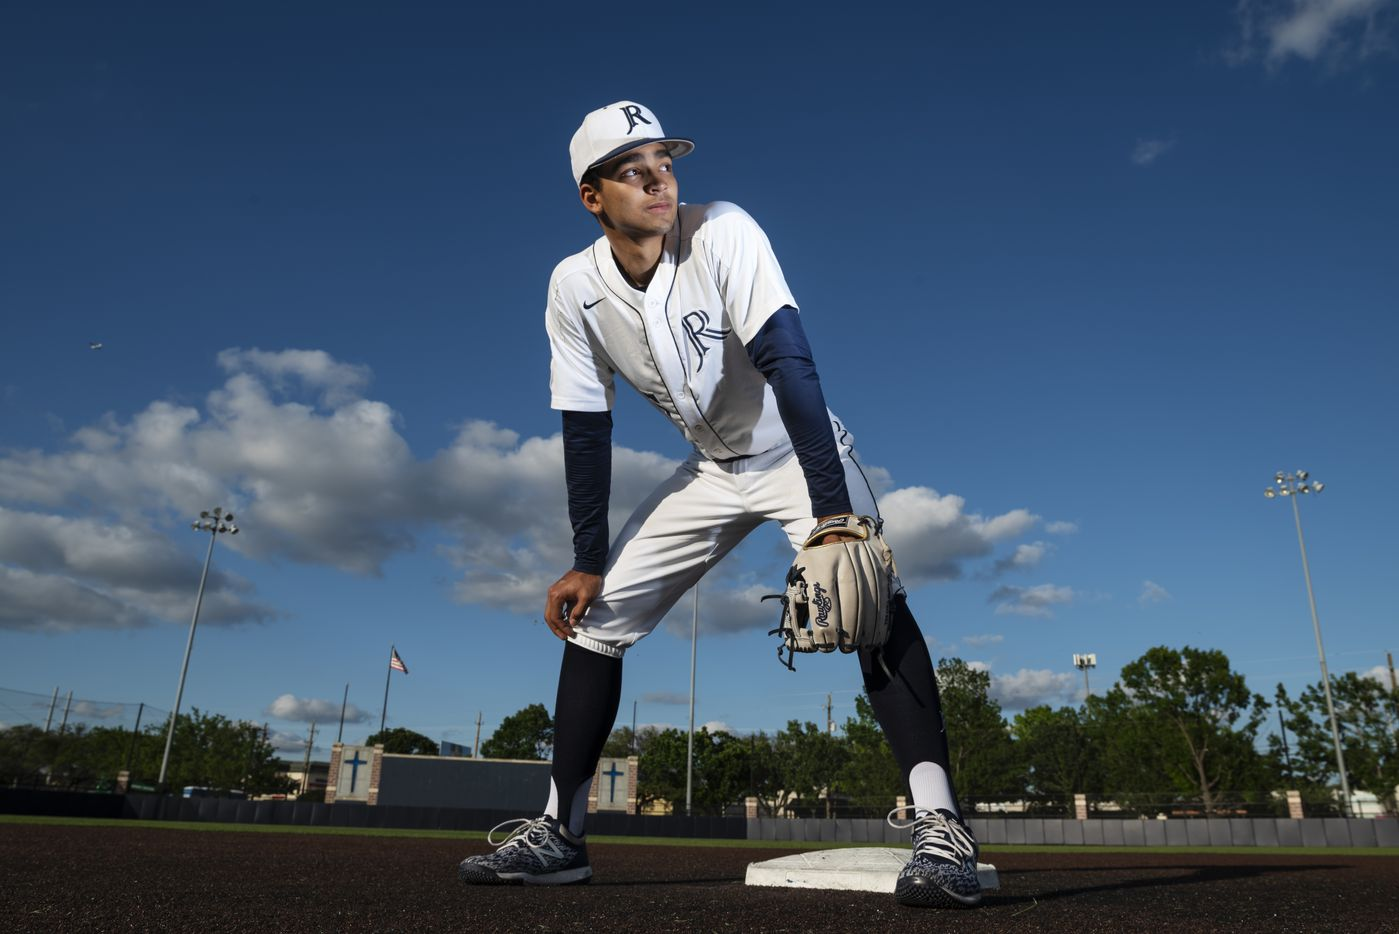 Jesuit senior shortstop Jordan Lawlar, 18, on the baseball field on the campus of Jesuit College Preparatory School of Dallas, on Tuesday, May 04, 2021.